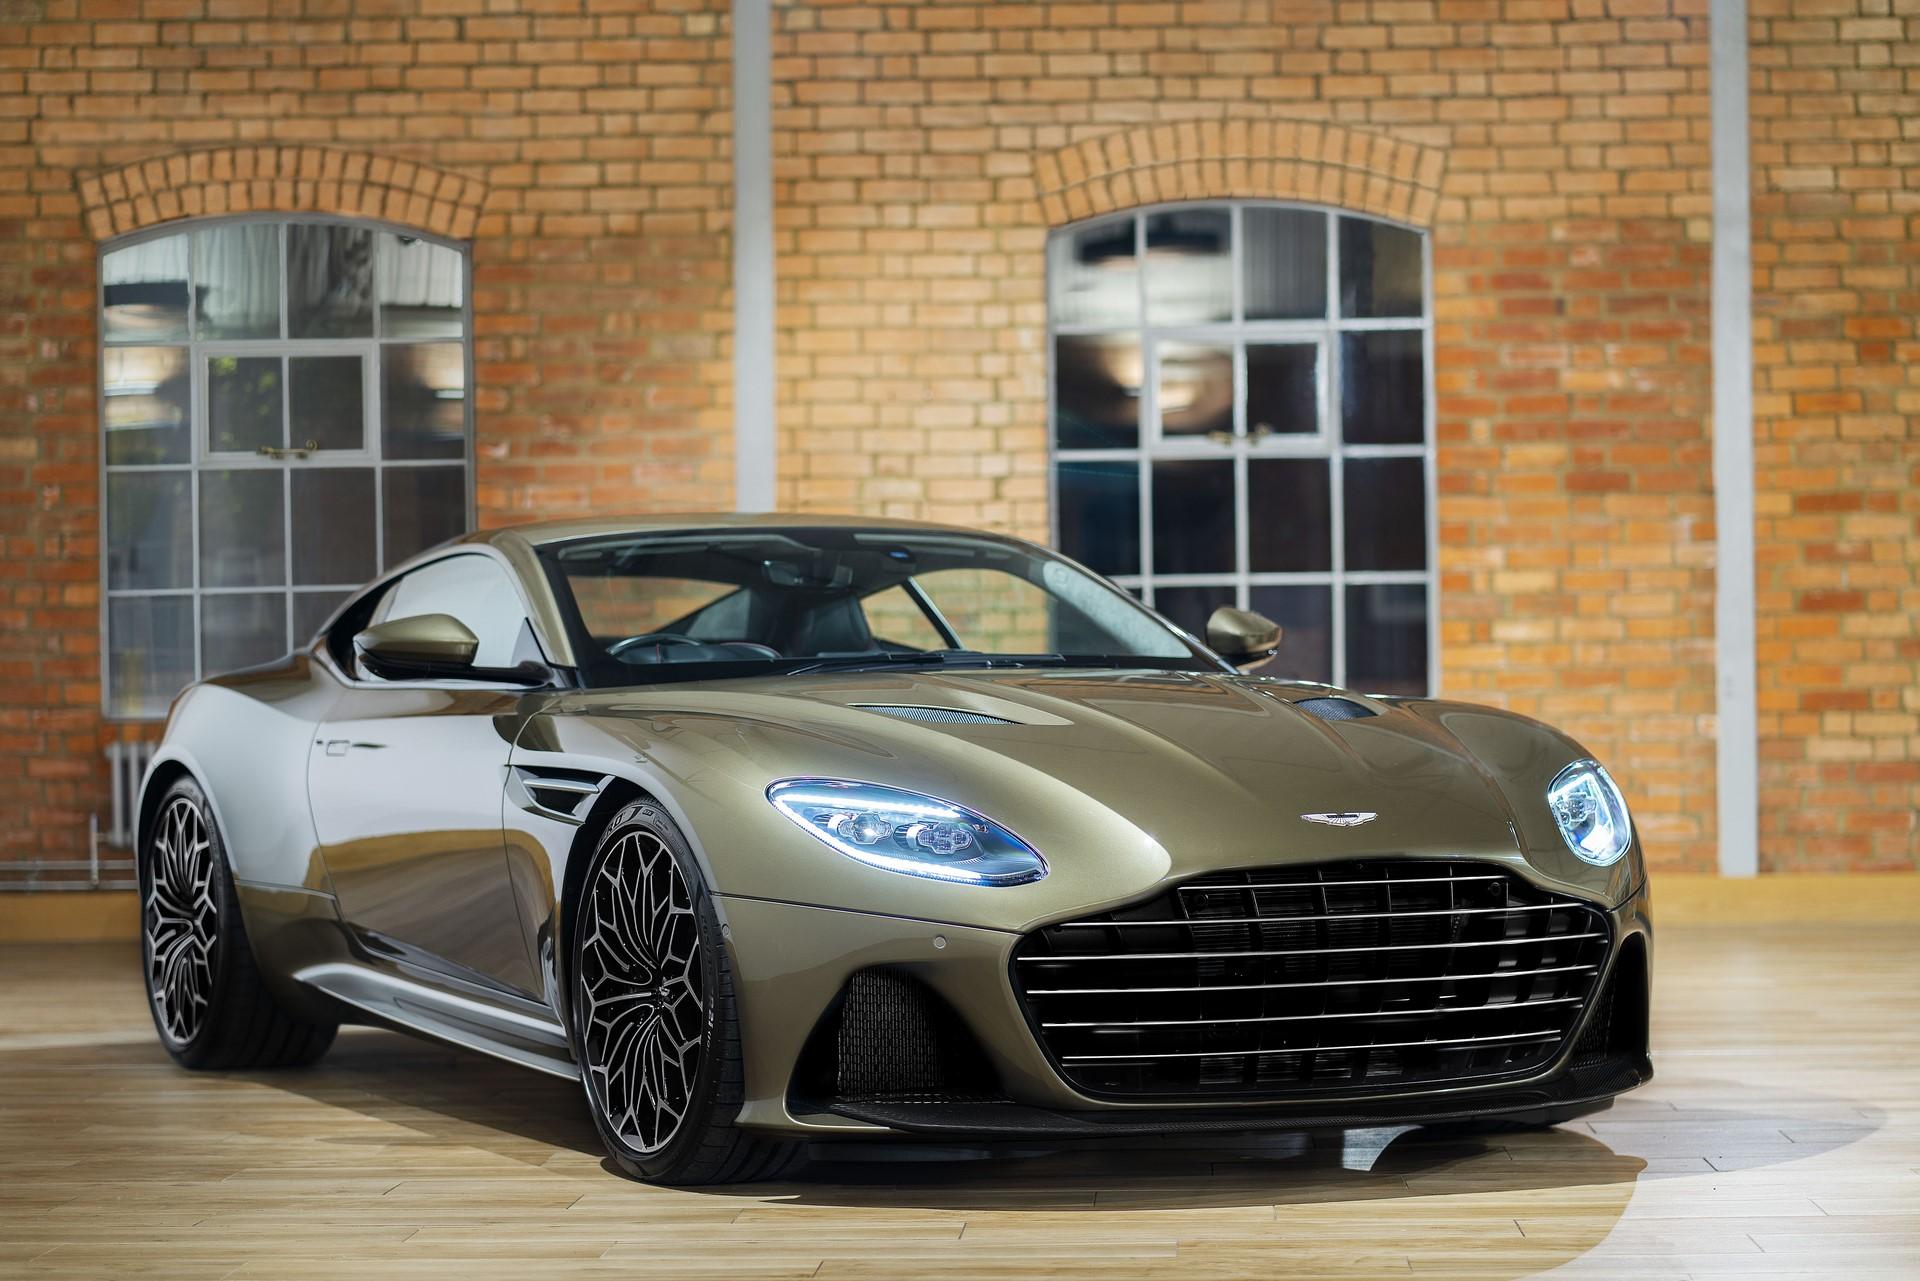 Aston-Martin-DBS-Superleggera-James-Bond-Special-Edition-2